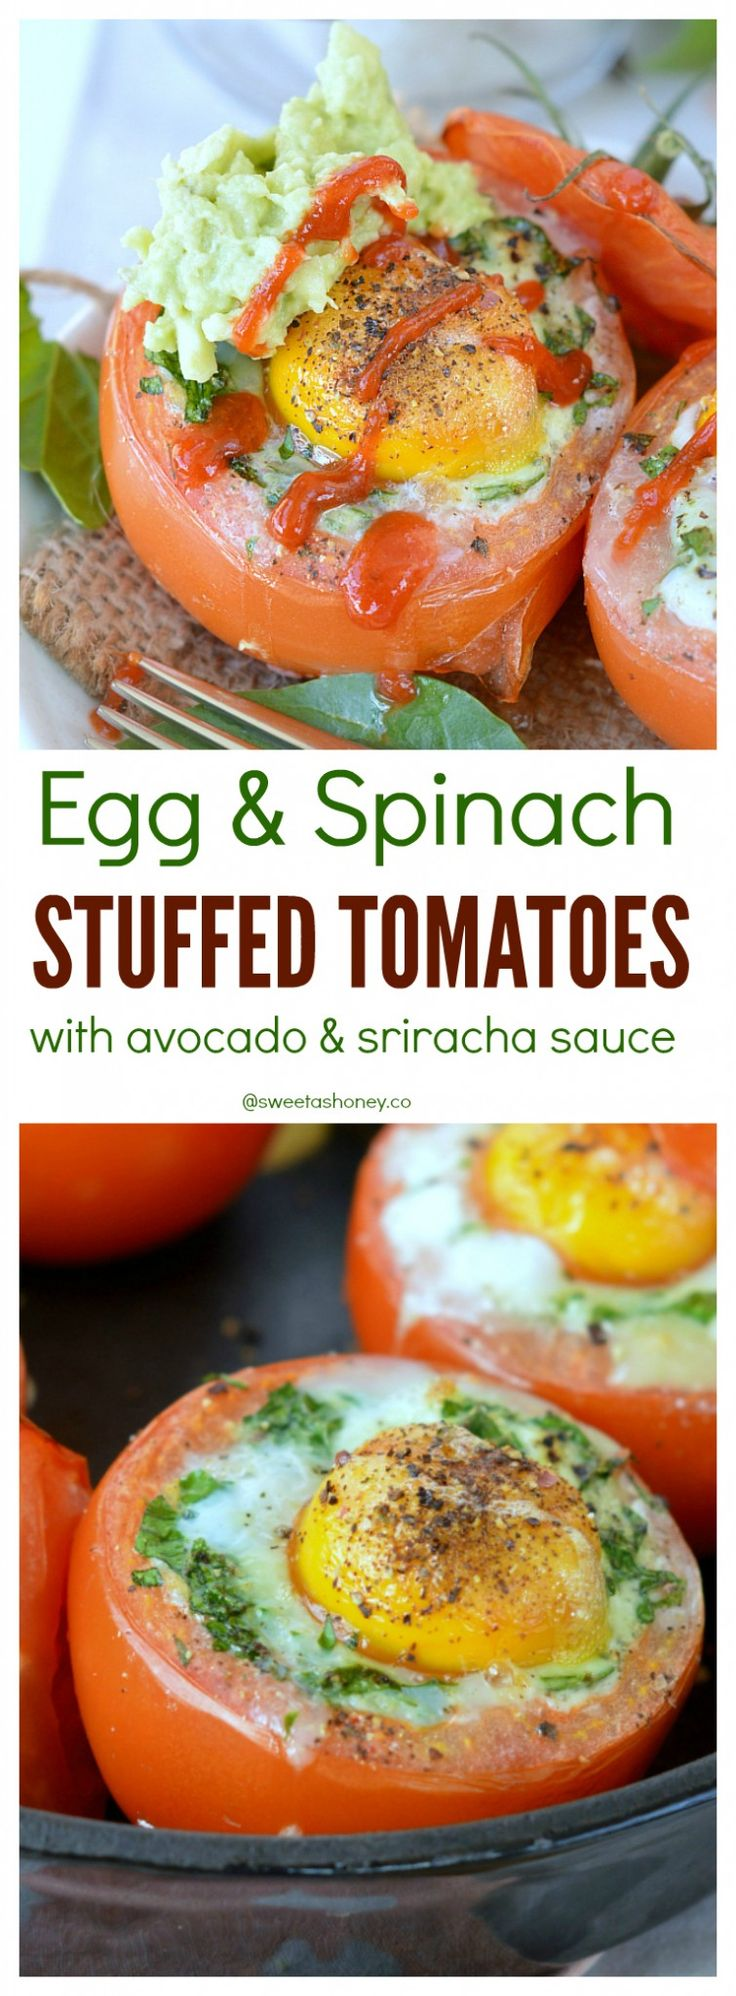 Stuffed tomatoes recipe healthy clean eating breakfast ideas.